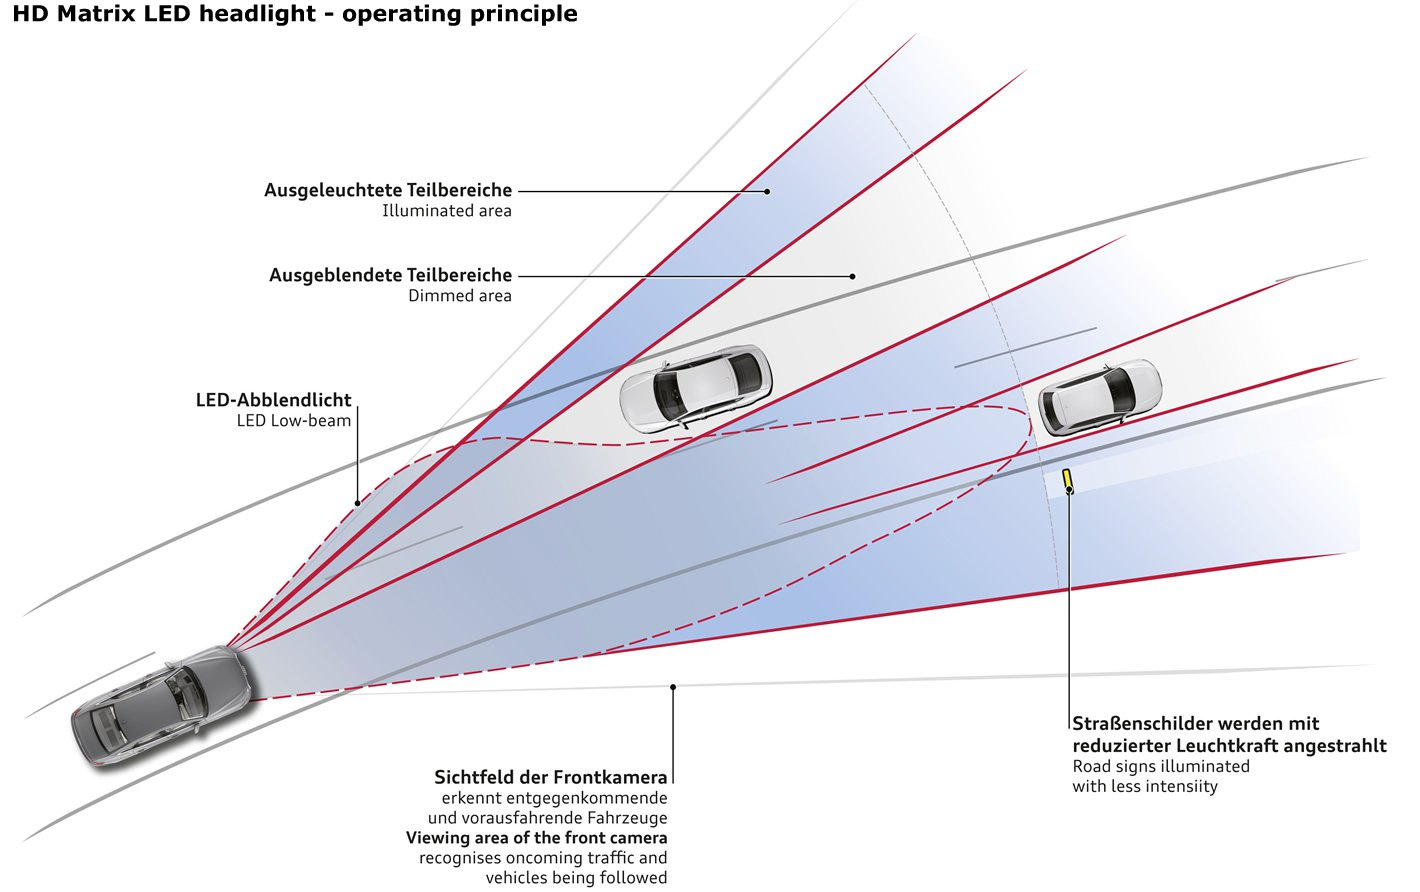 Audi A6 - sposób działania HD Matrix LED